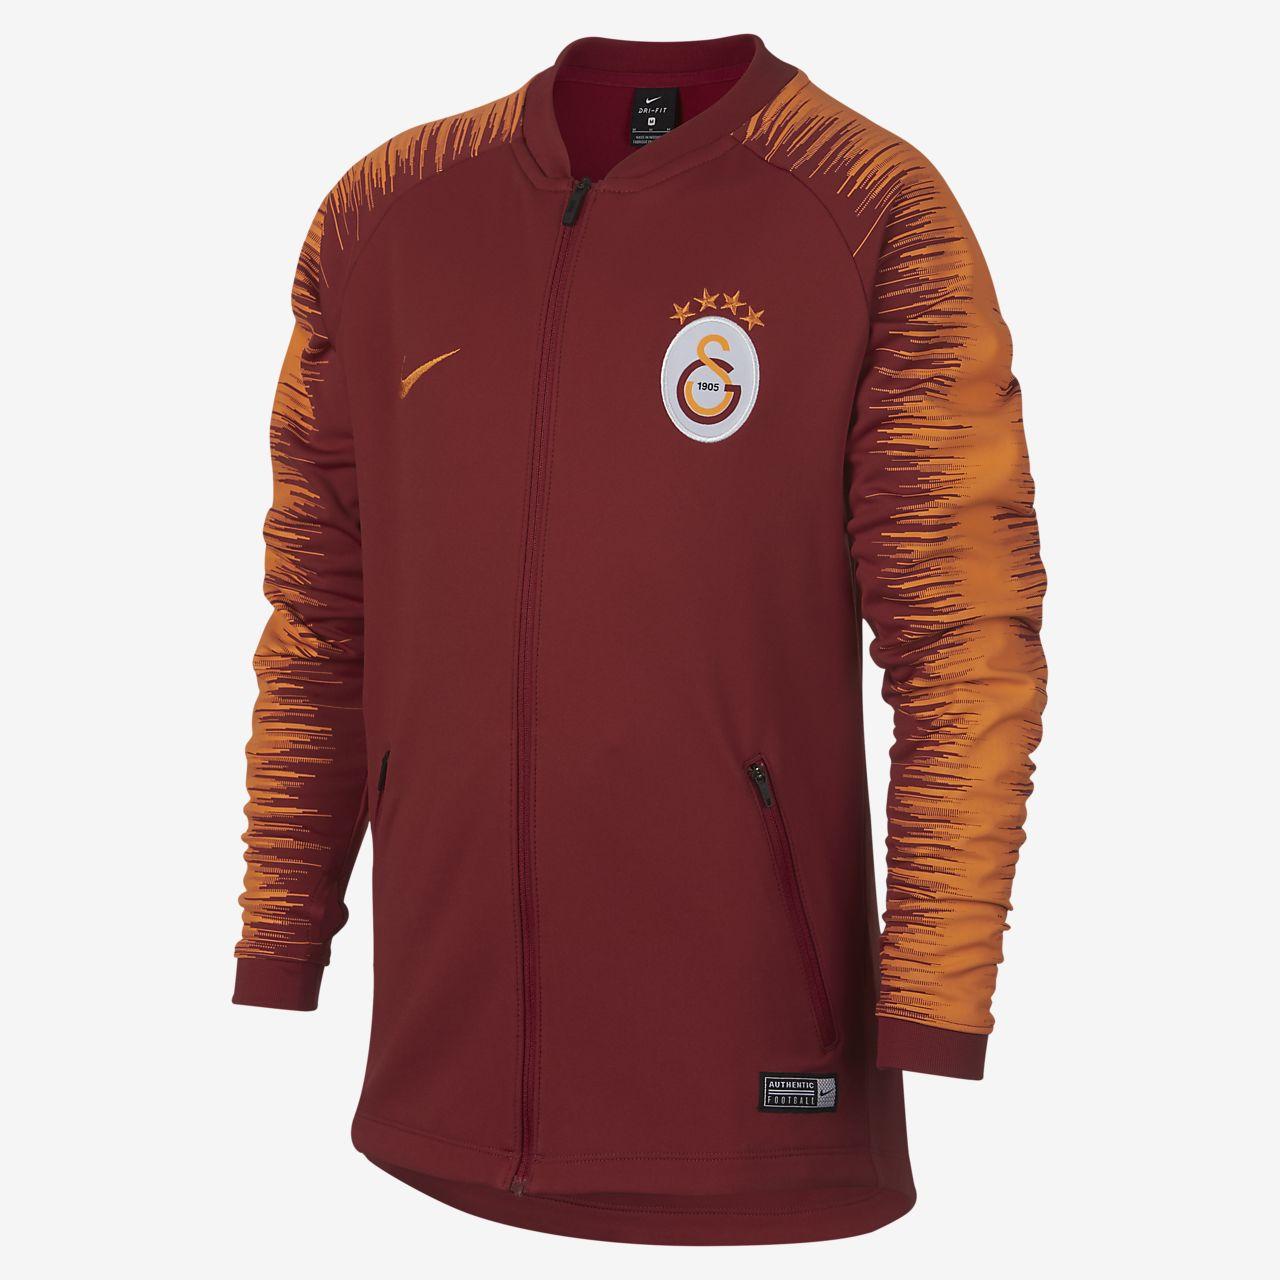 Galatasaray Ältere S Für Fußballjacke KinderCh kAnthem VUMpSqz